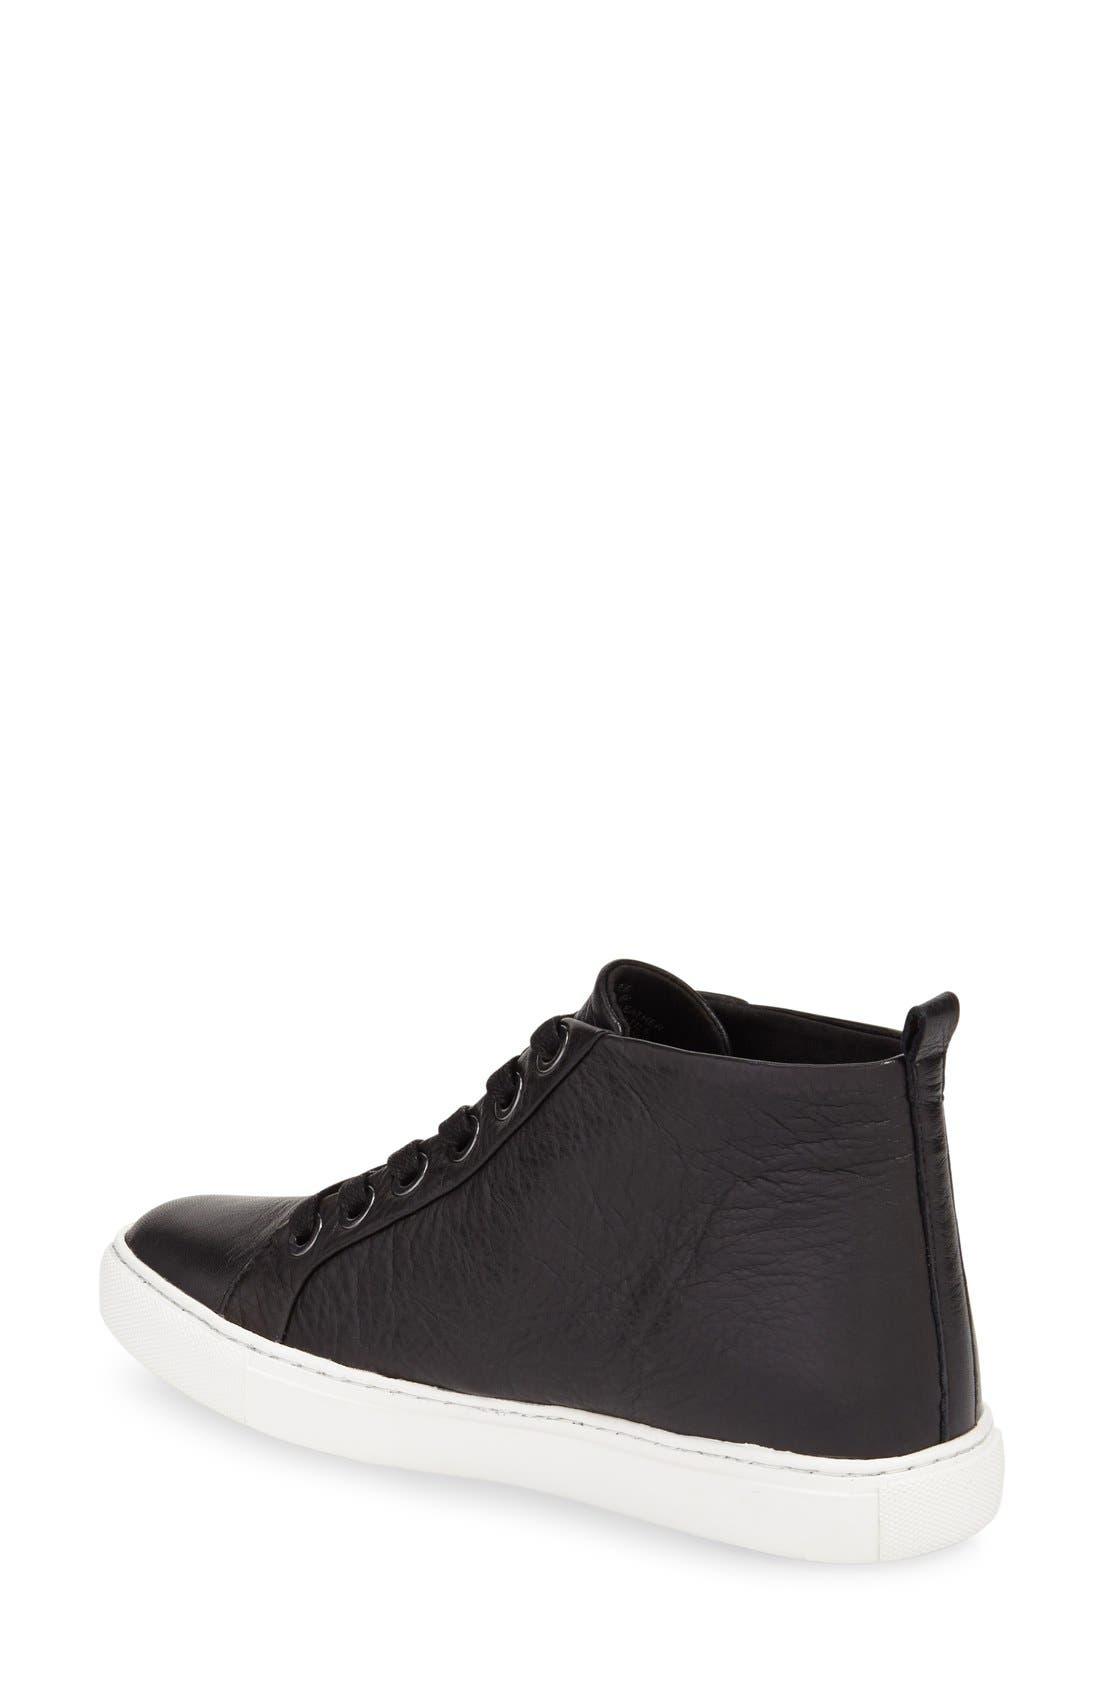 Alternate Image 2  - Kenneth Cole New York 'Kaleb' High Top Sneaker (Women)